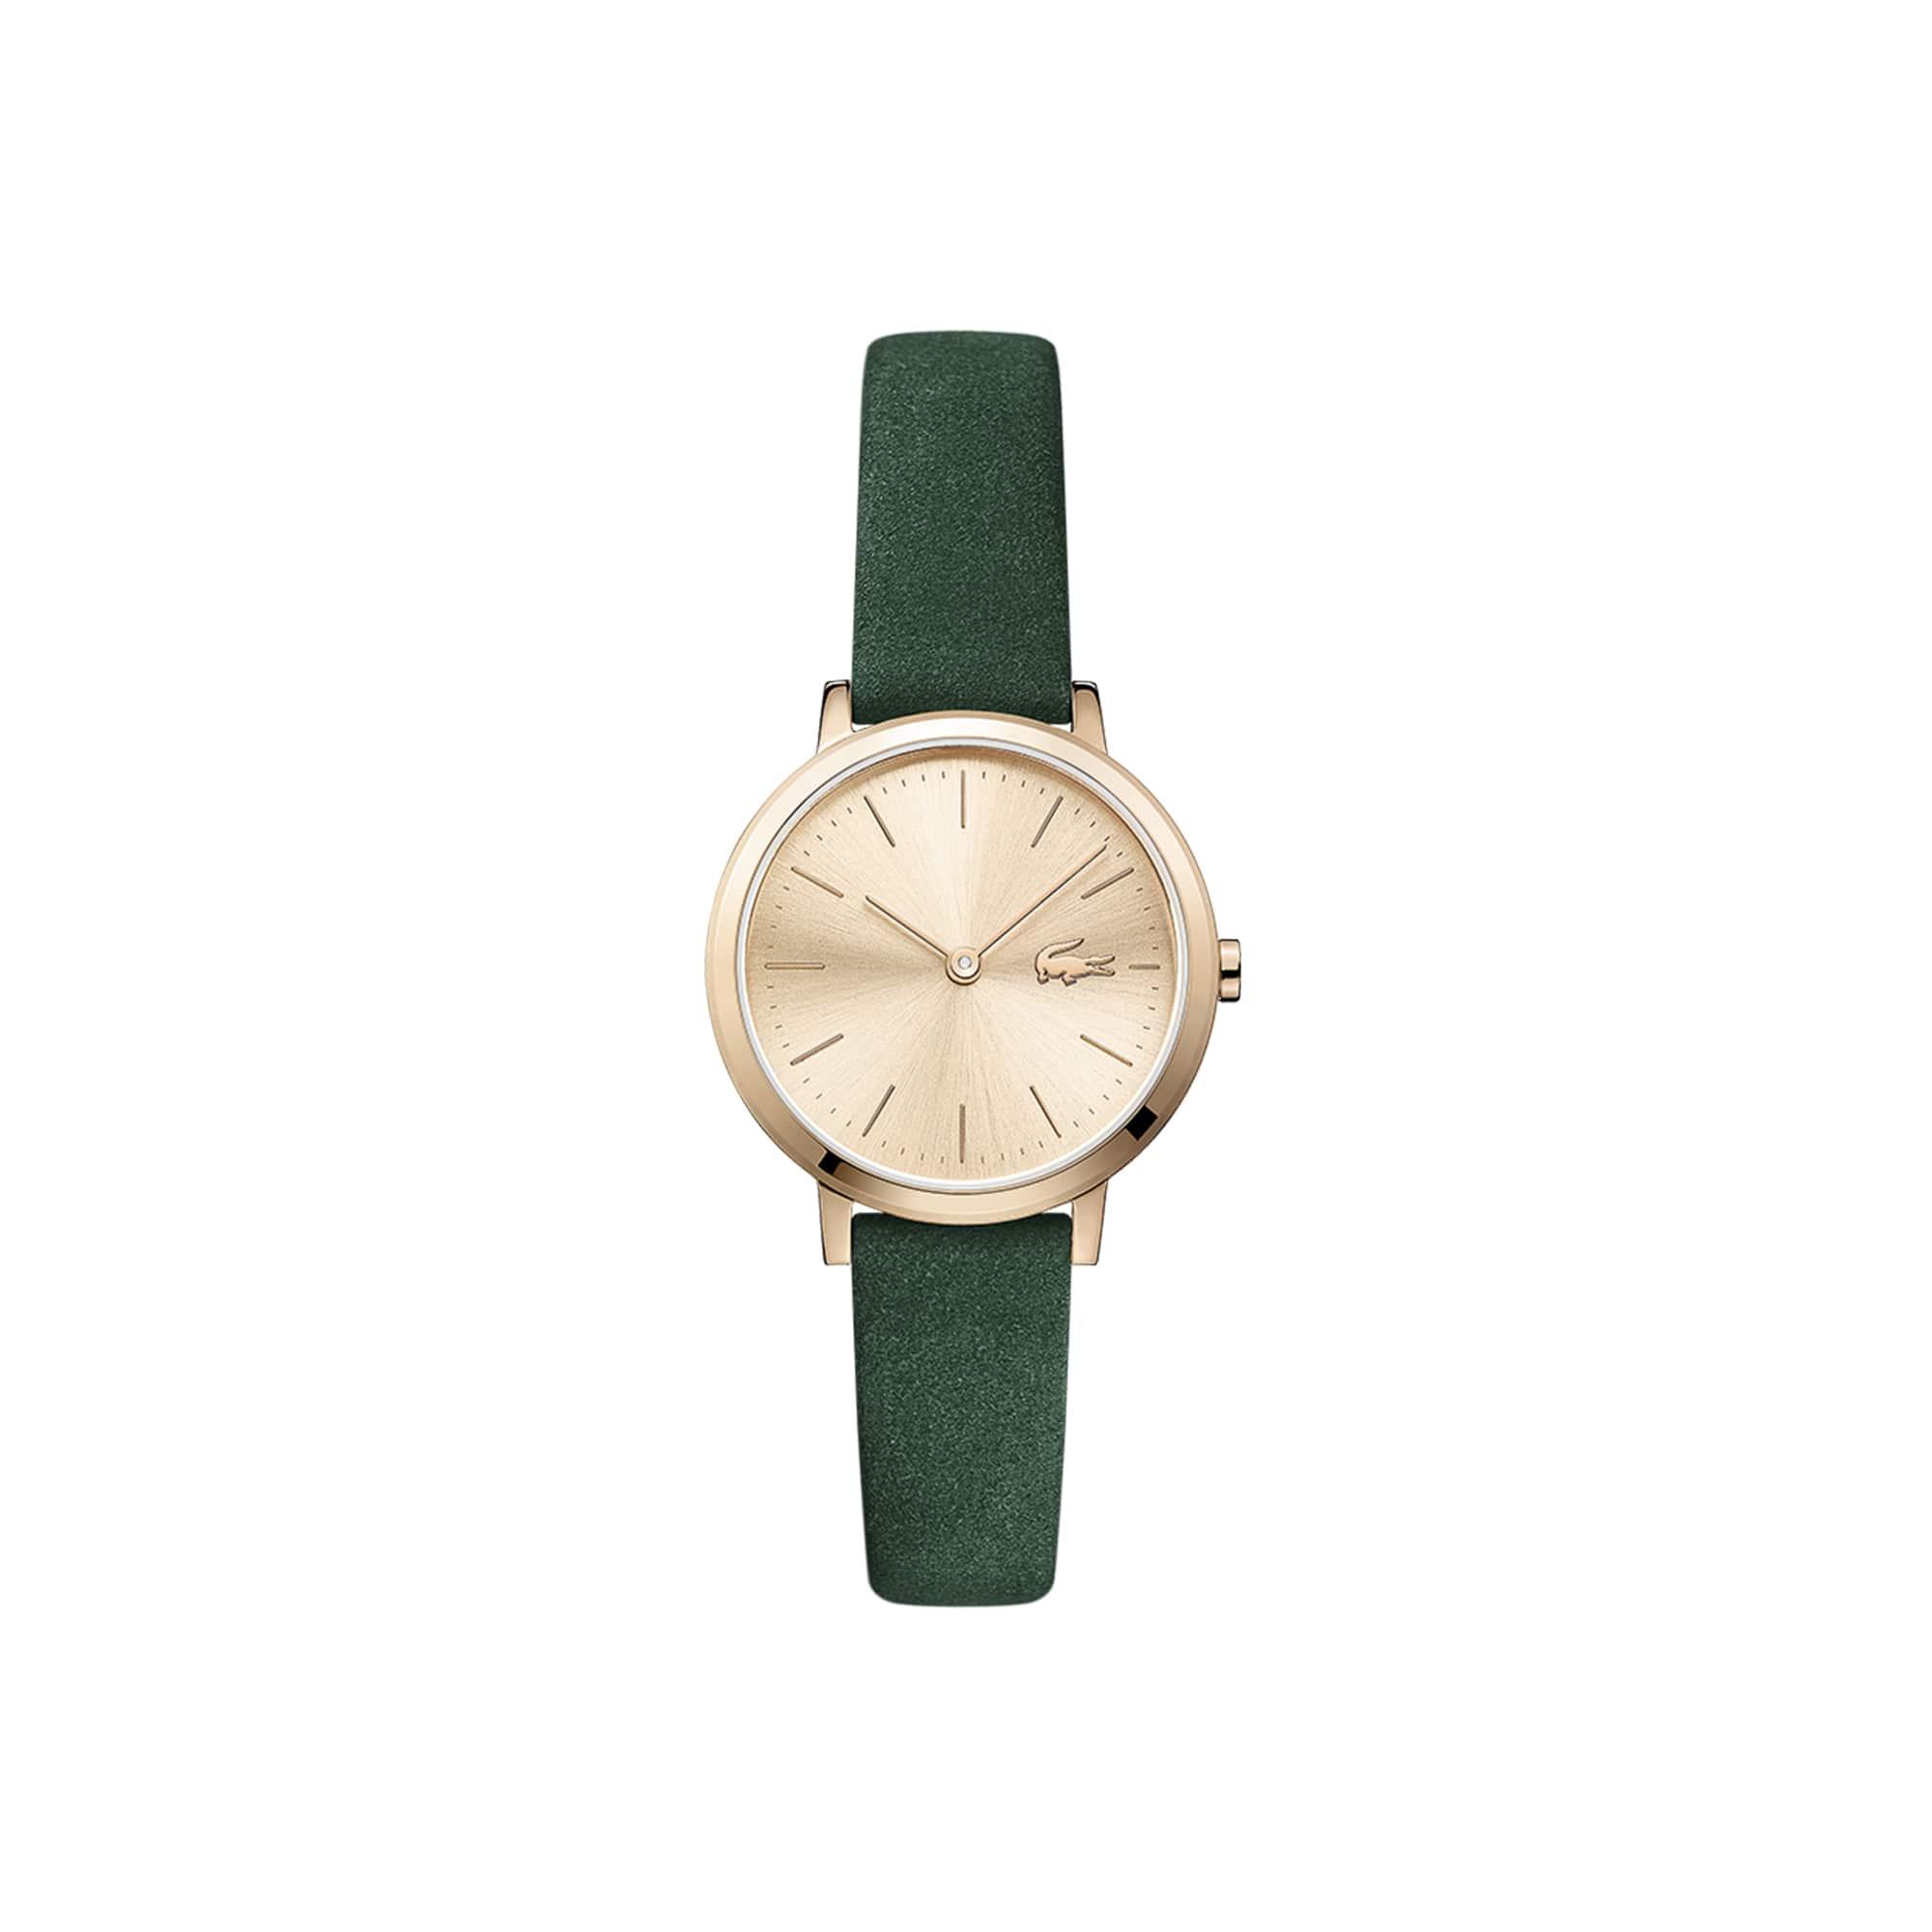 Reloj de Mujer Mini Moon Ultrafino con Correa de Piel de Ante Verde